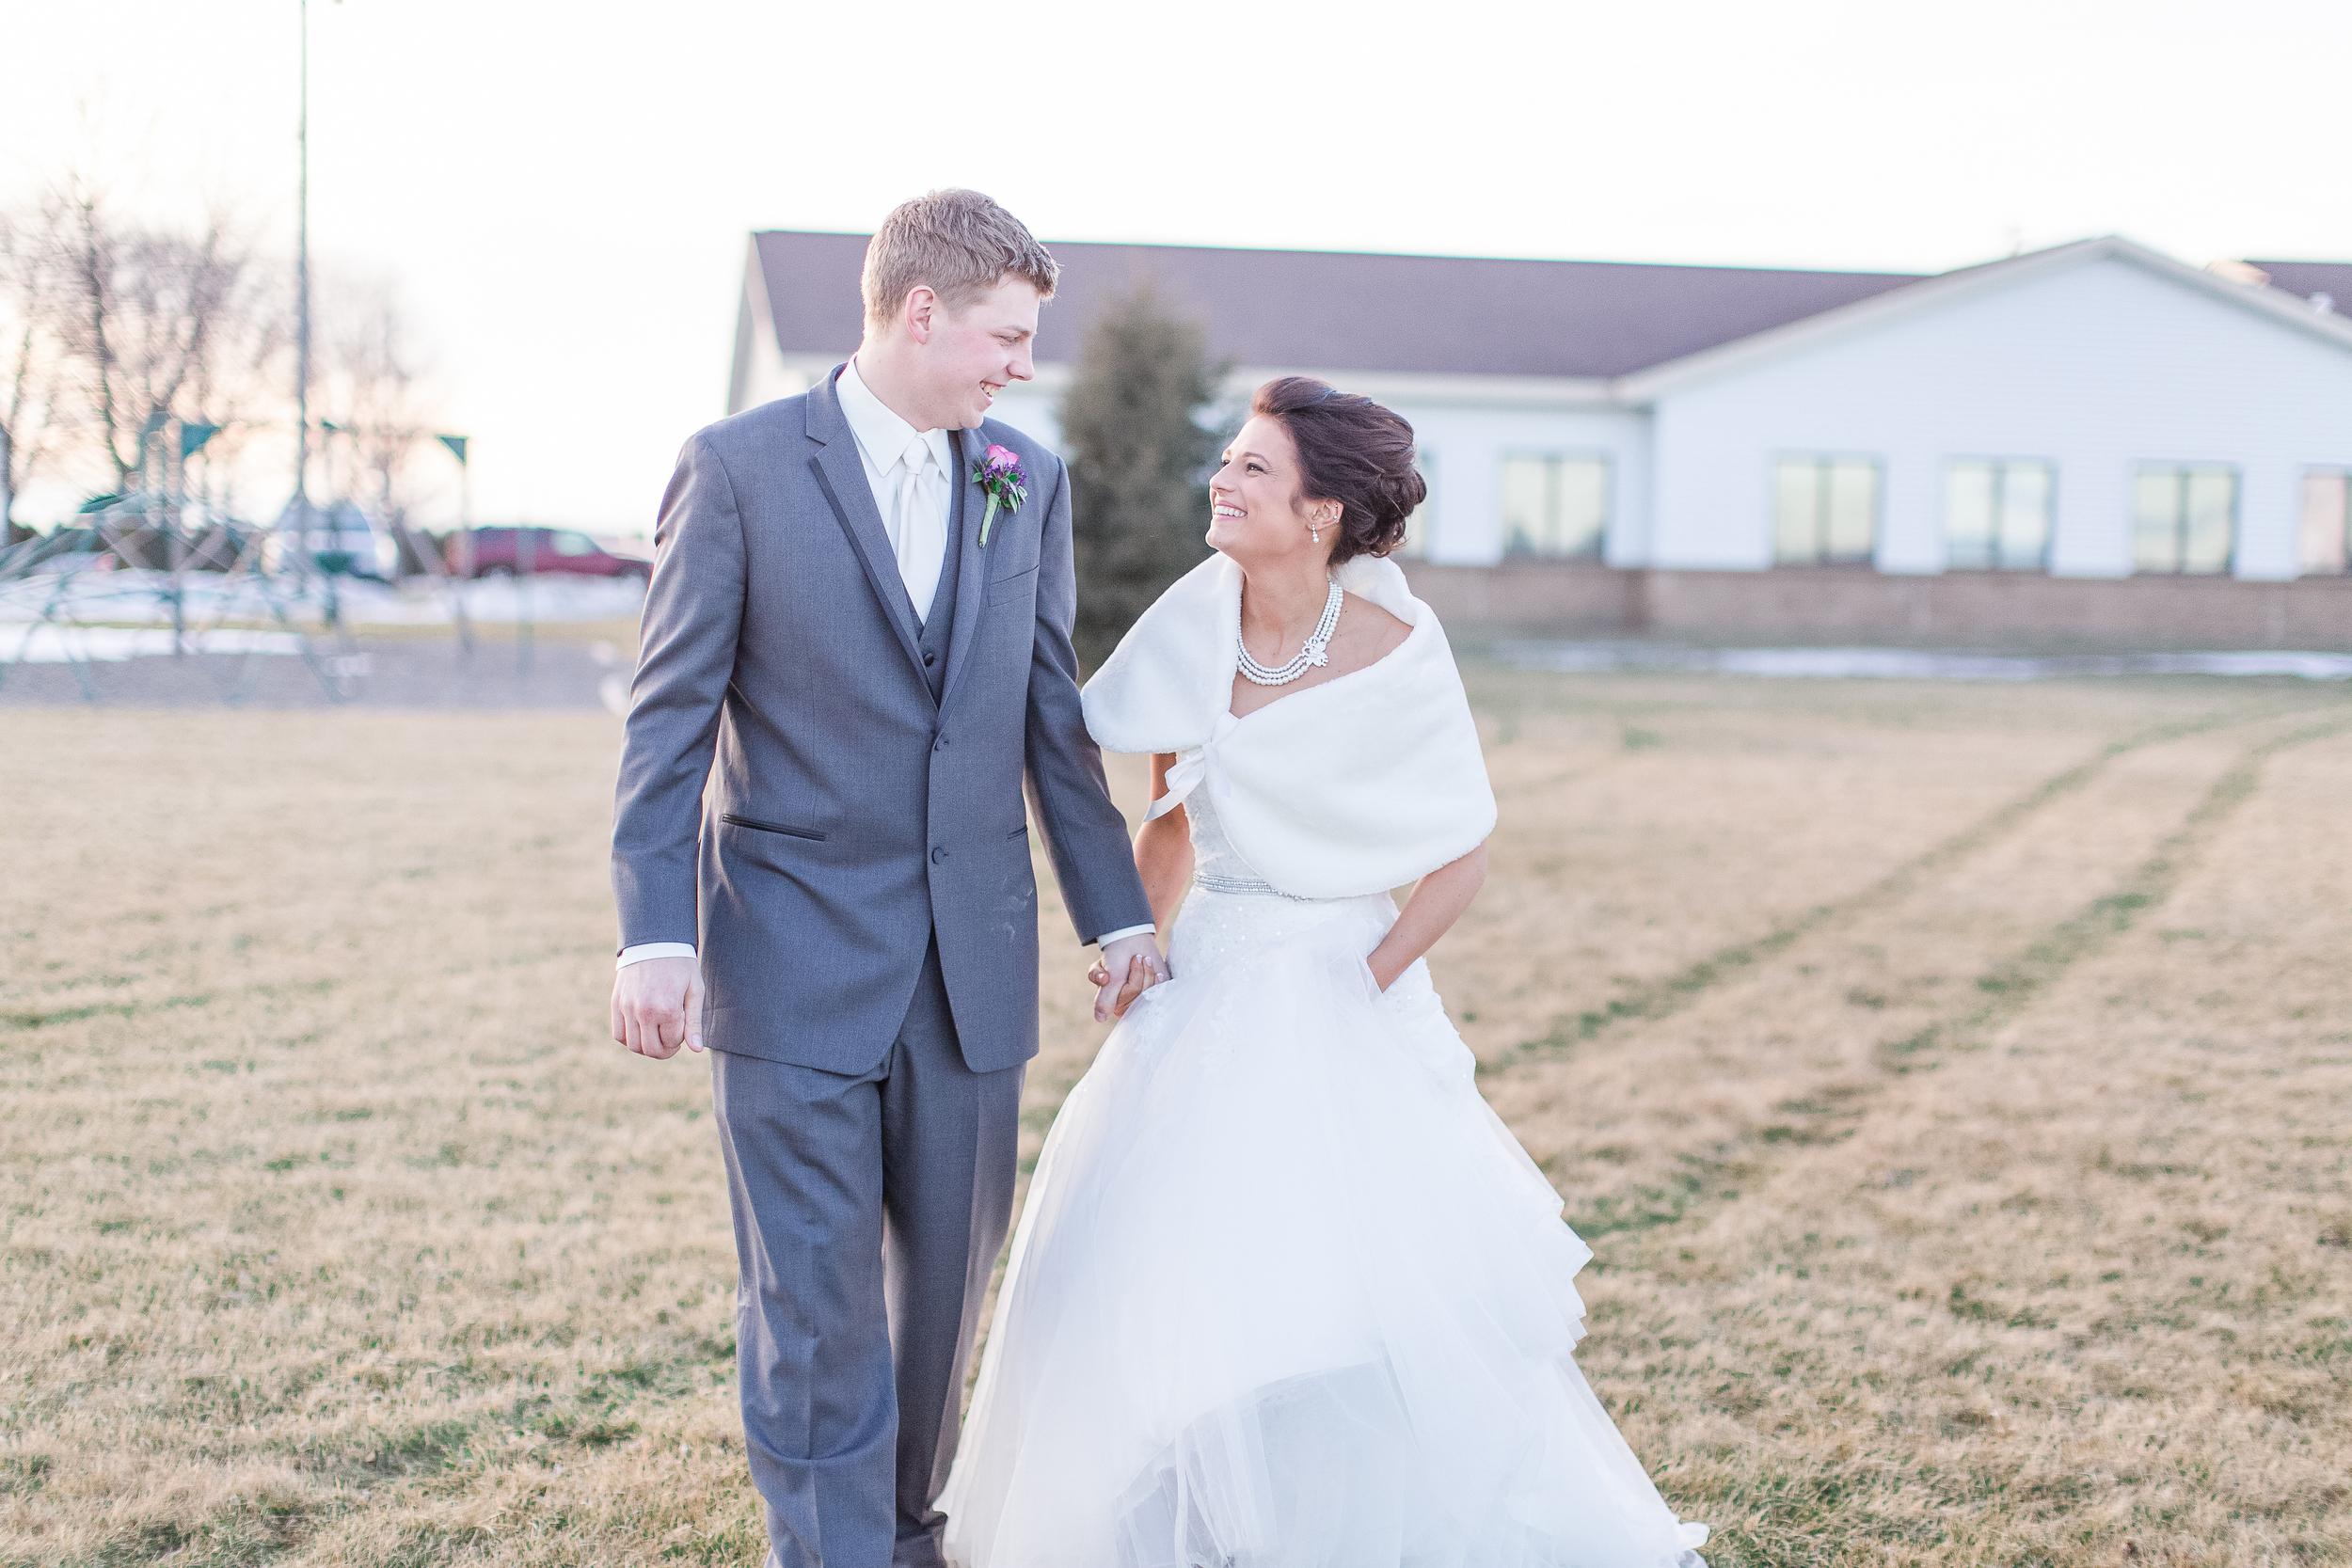 #brideandgroom #mnwedding #winterwedding